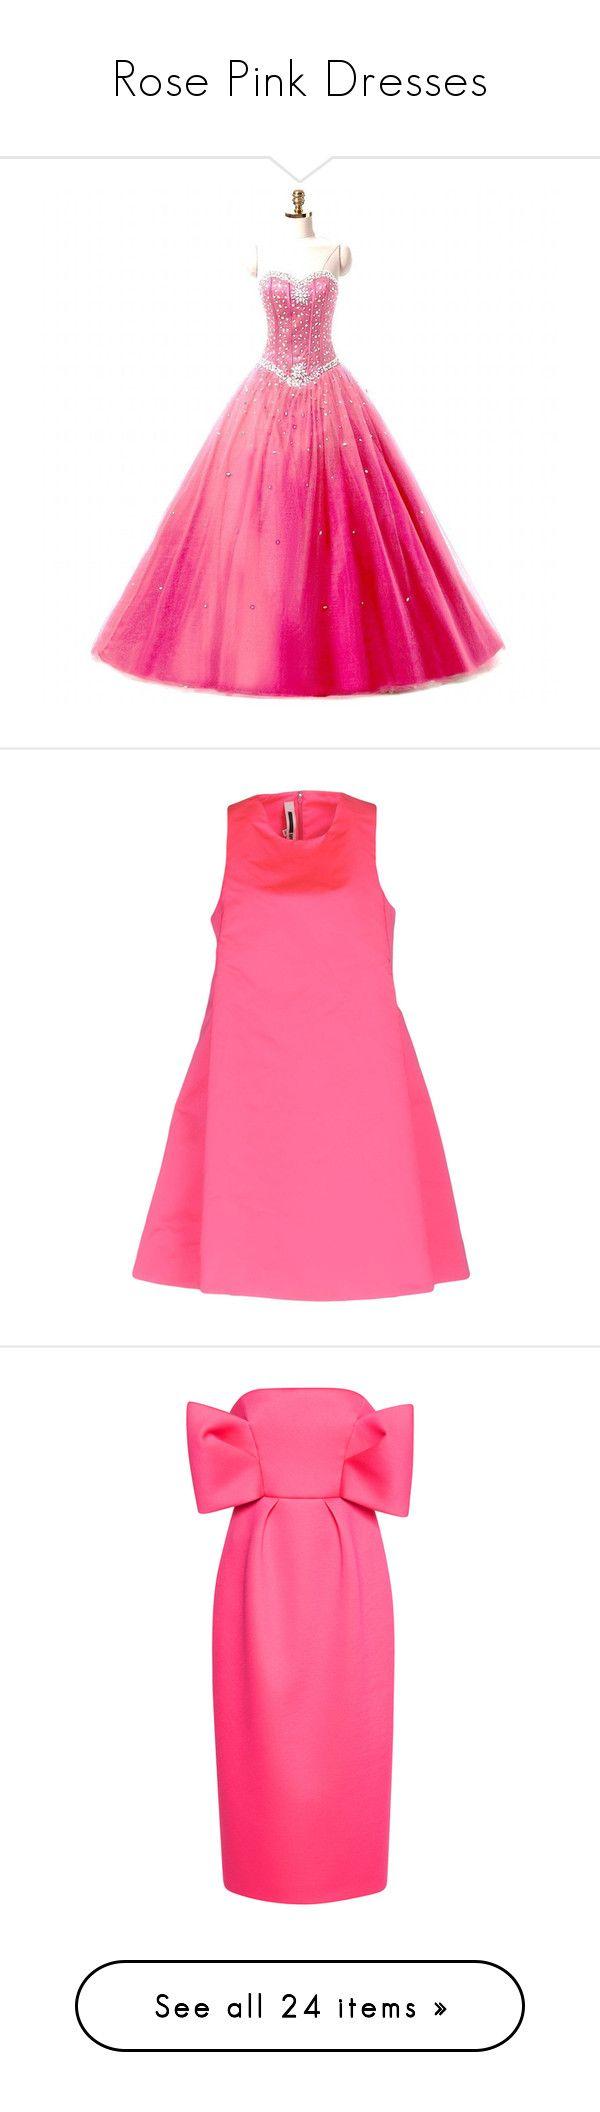 Rose Pink Dresses\